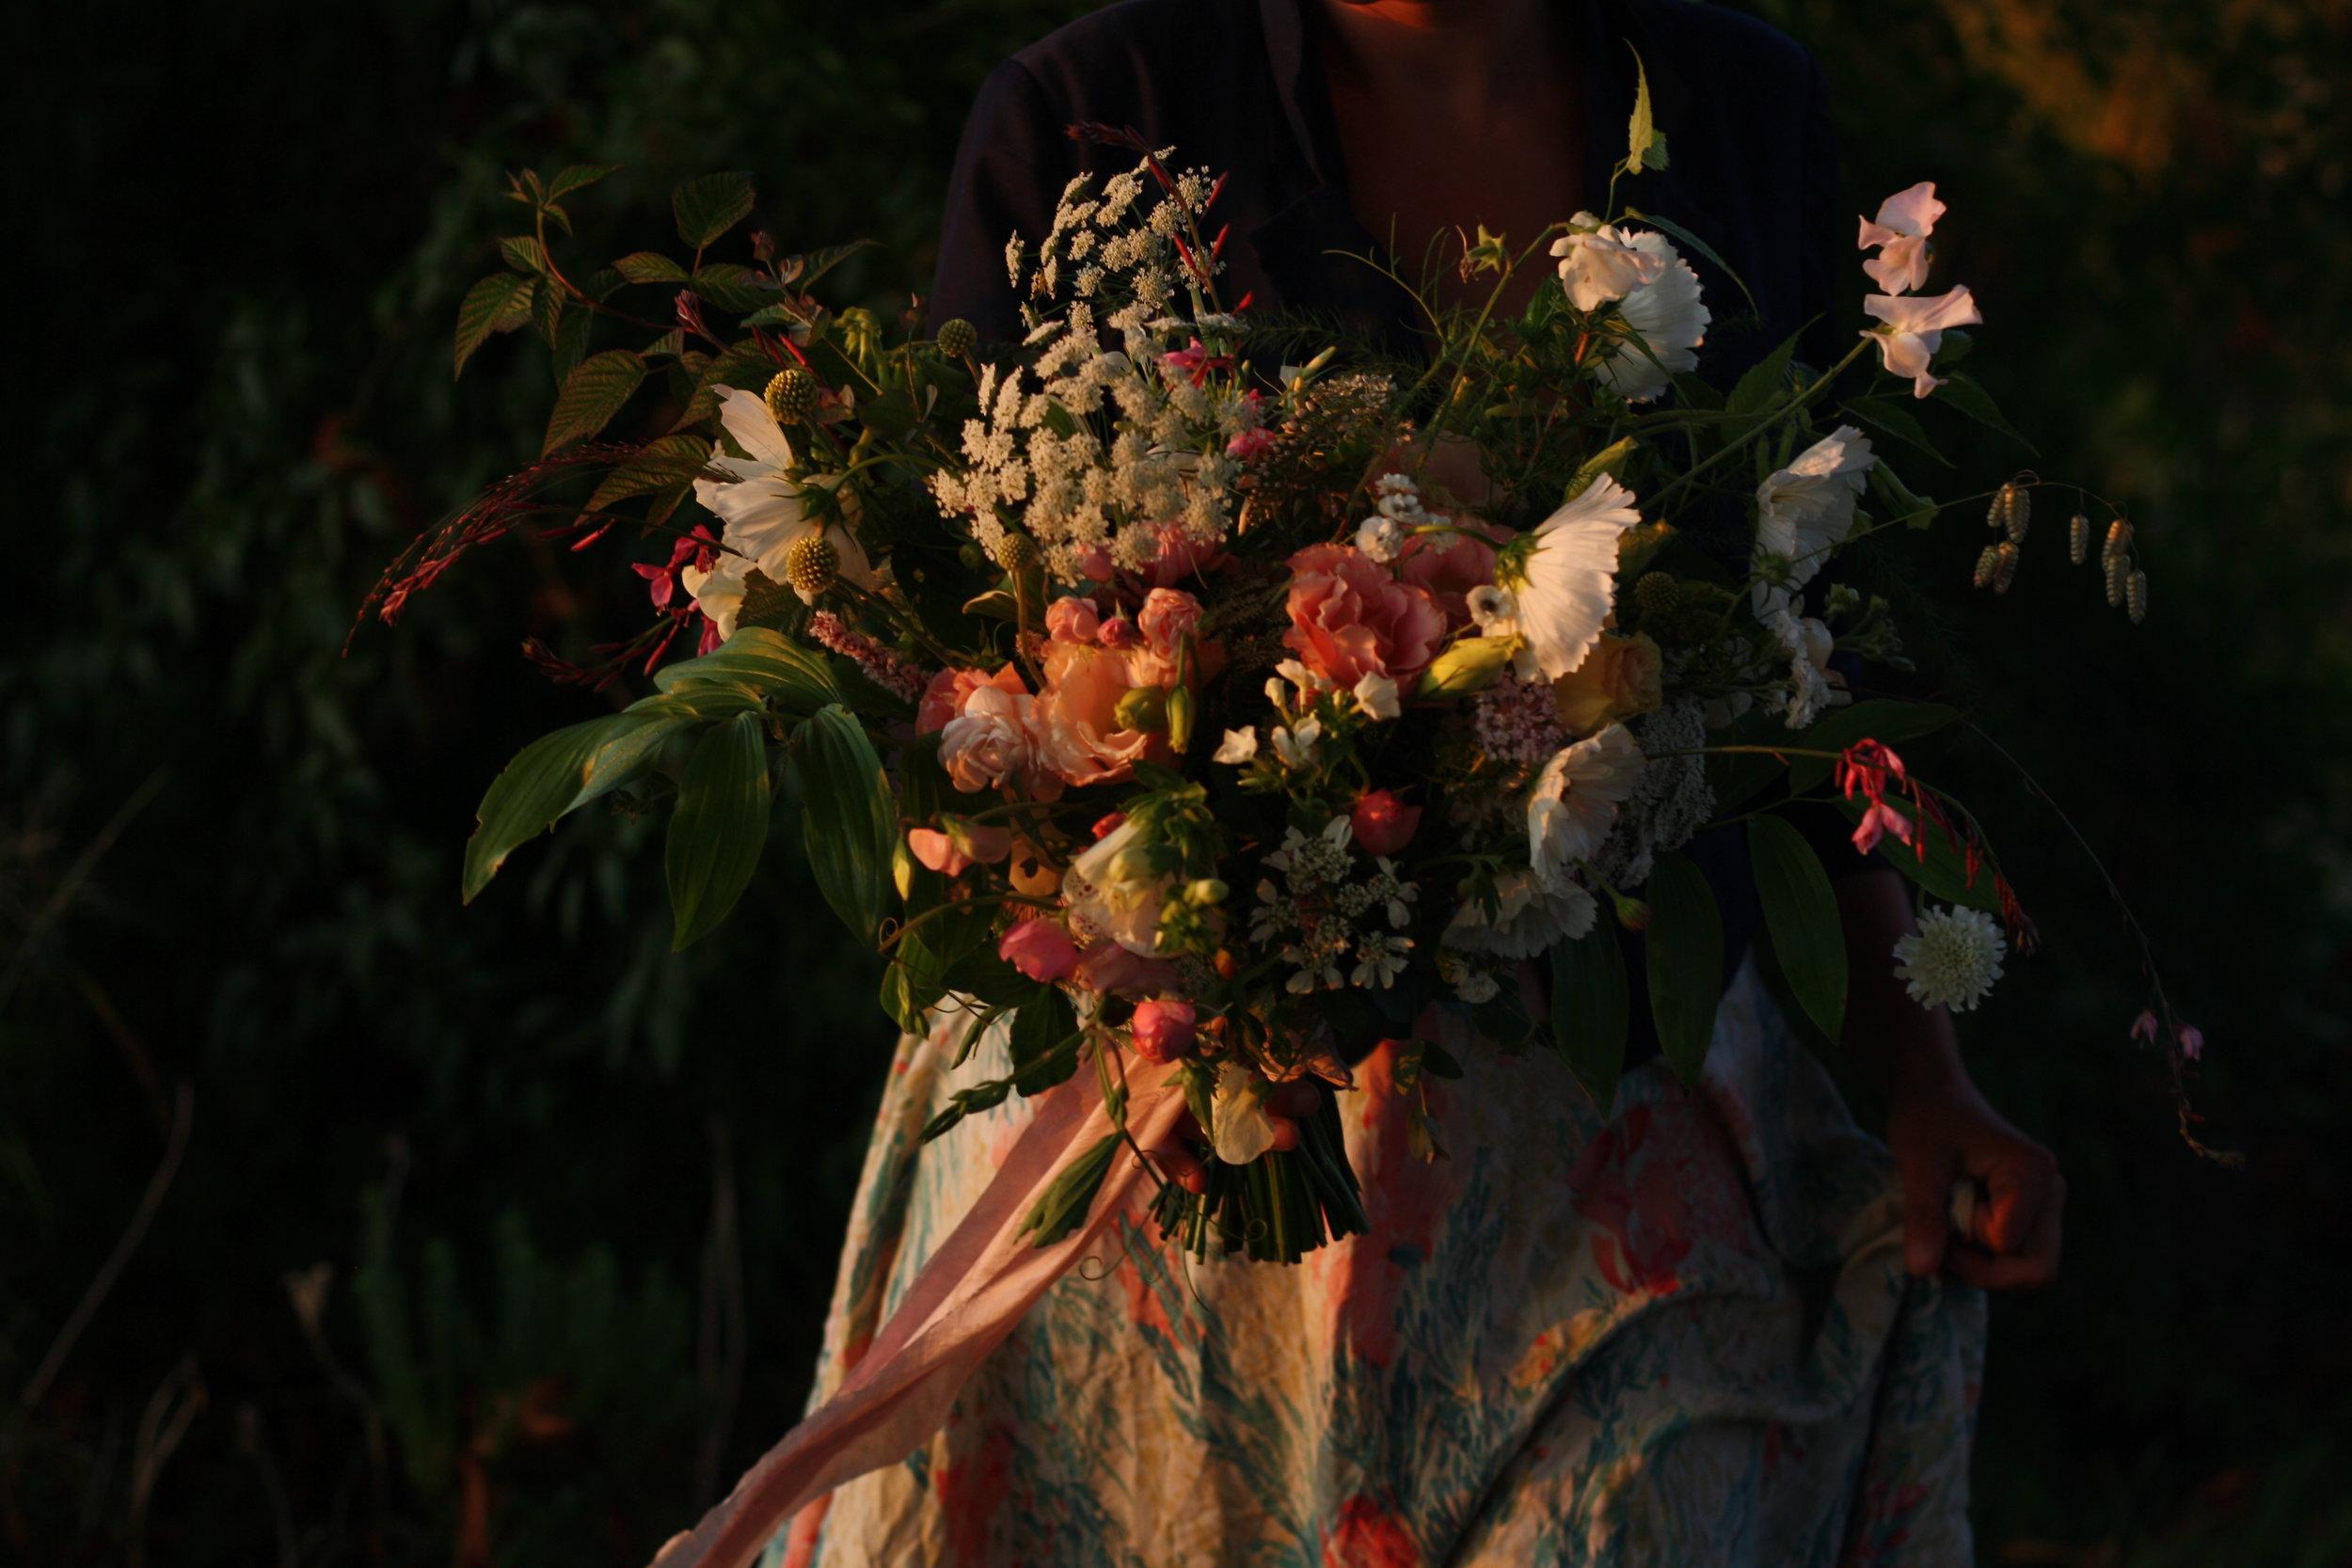 Wedding bouquet from Hedgerow. Halifax, Nova Scotia.